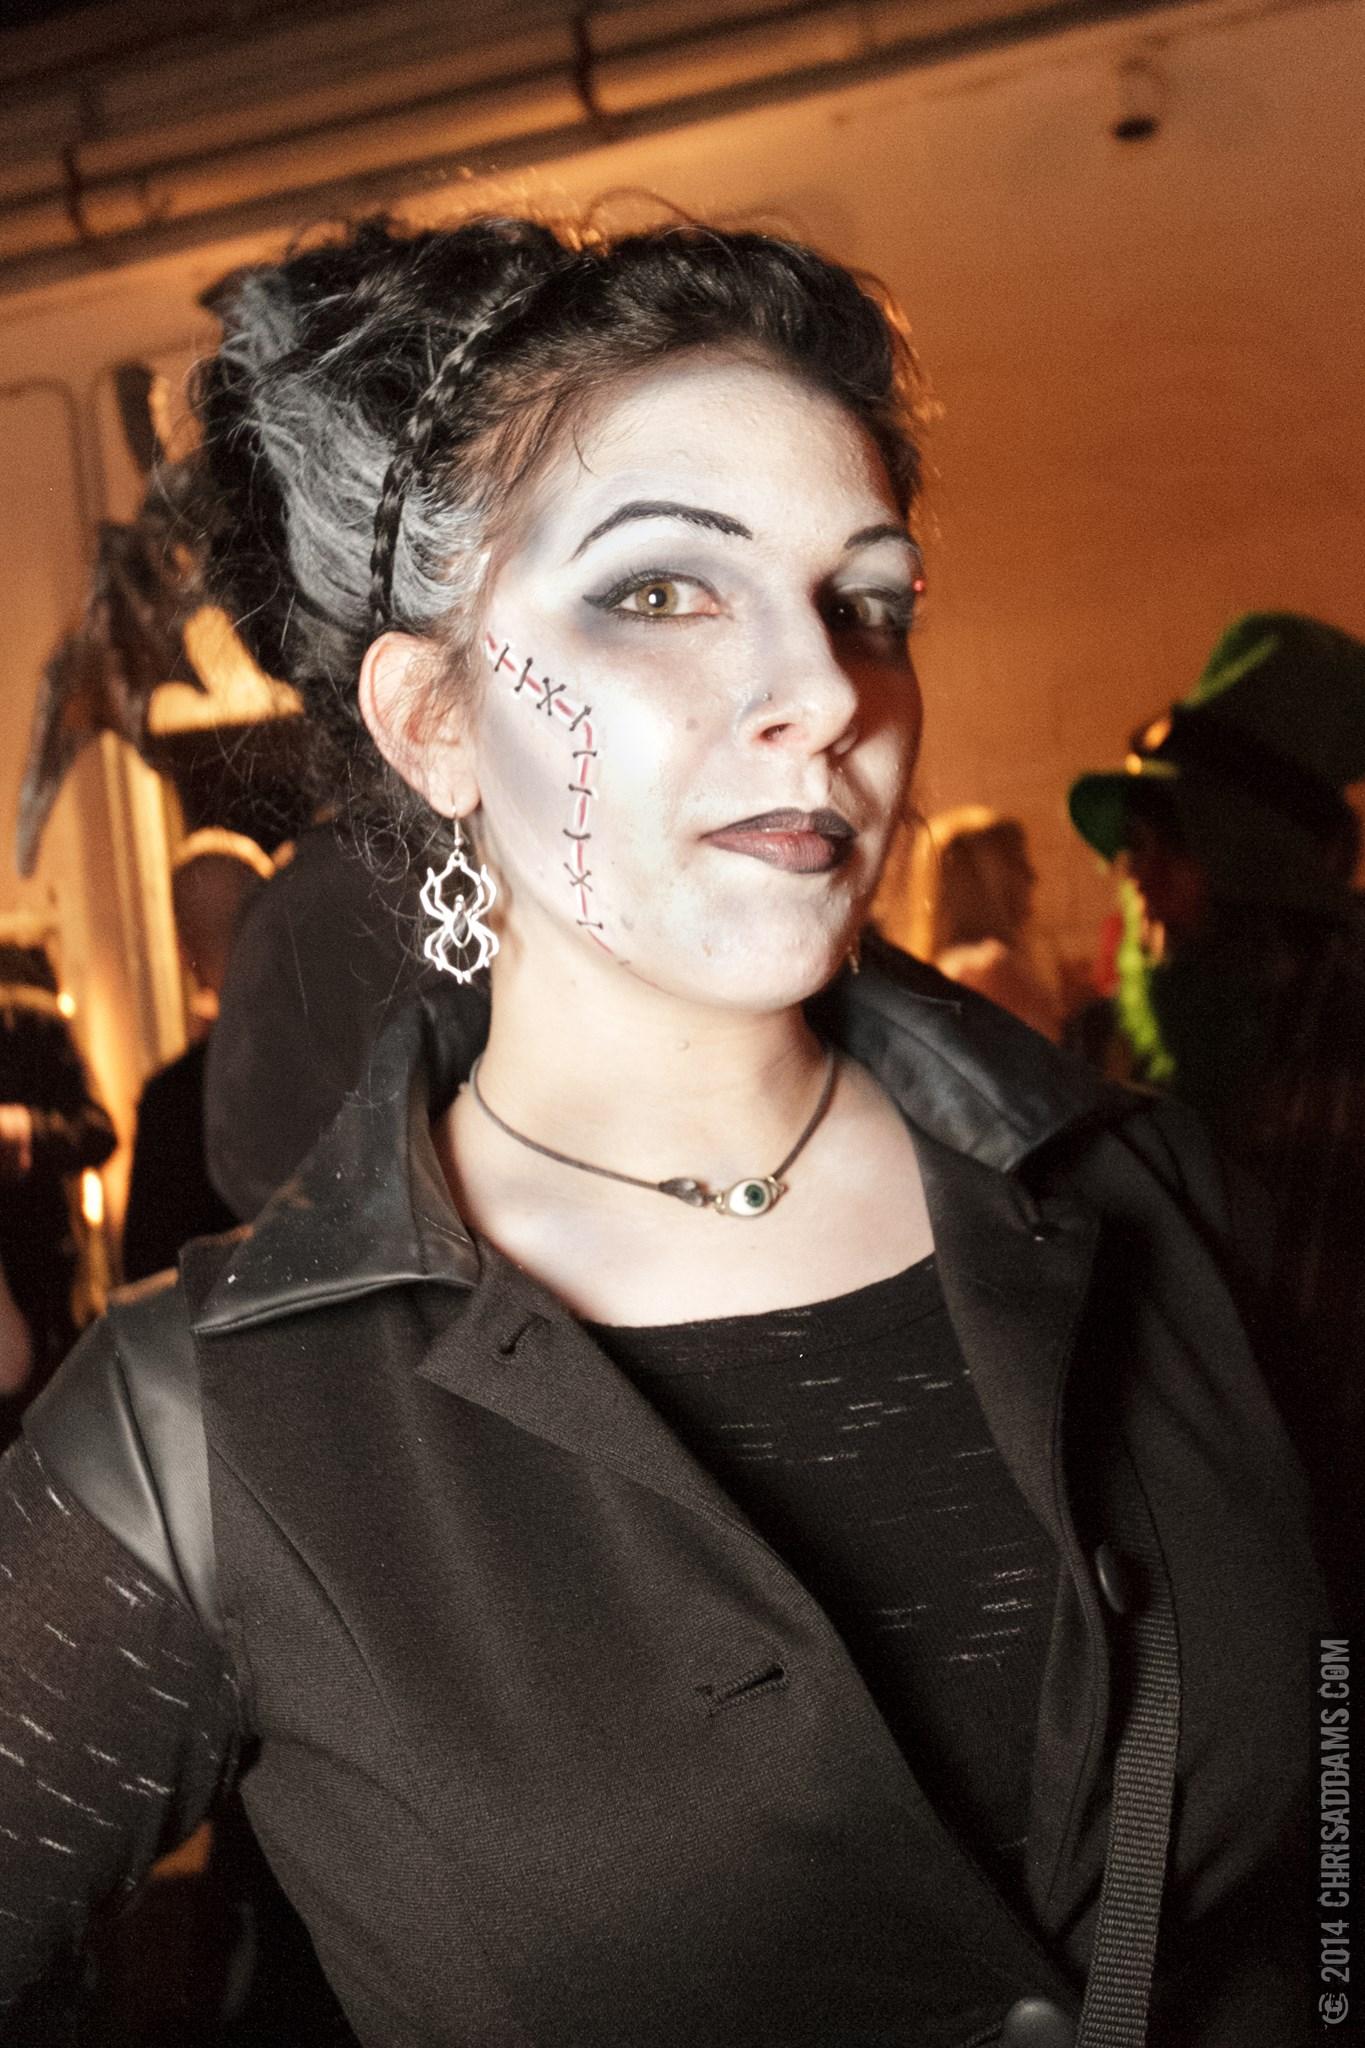 TheHavenClub-Goth-Industrial-Dance-Alternative-Northampton-MA (34).jpg